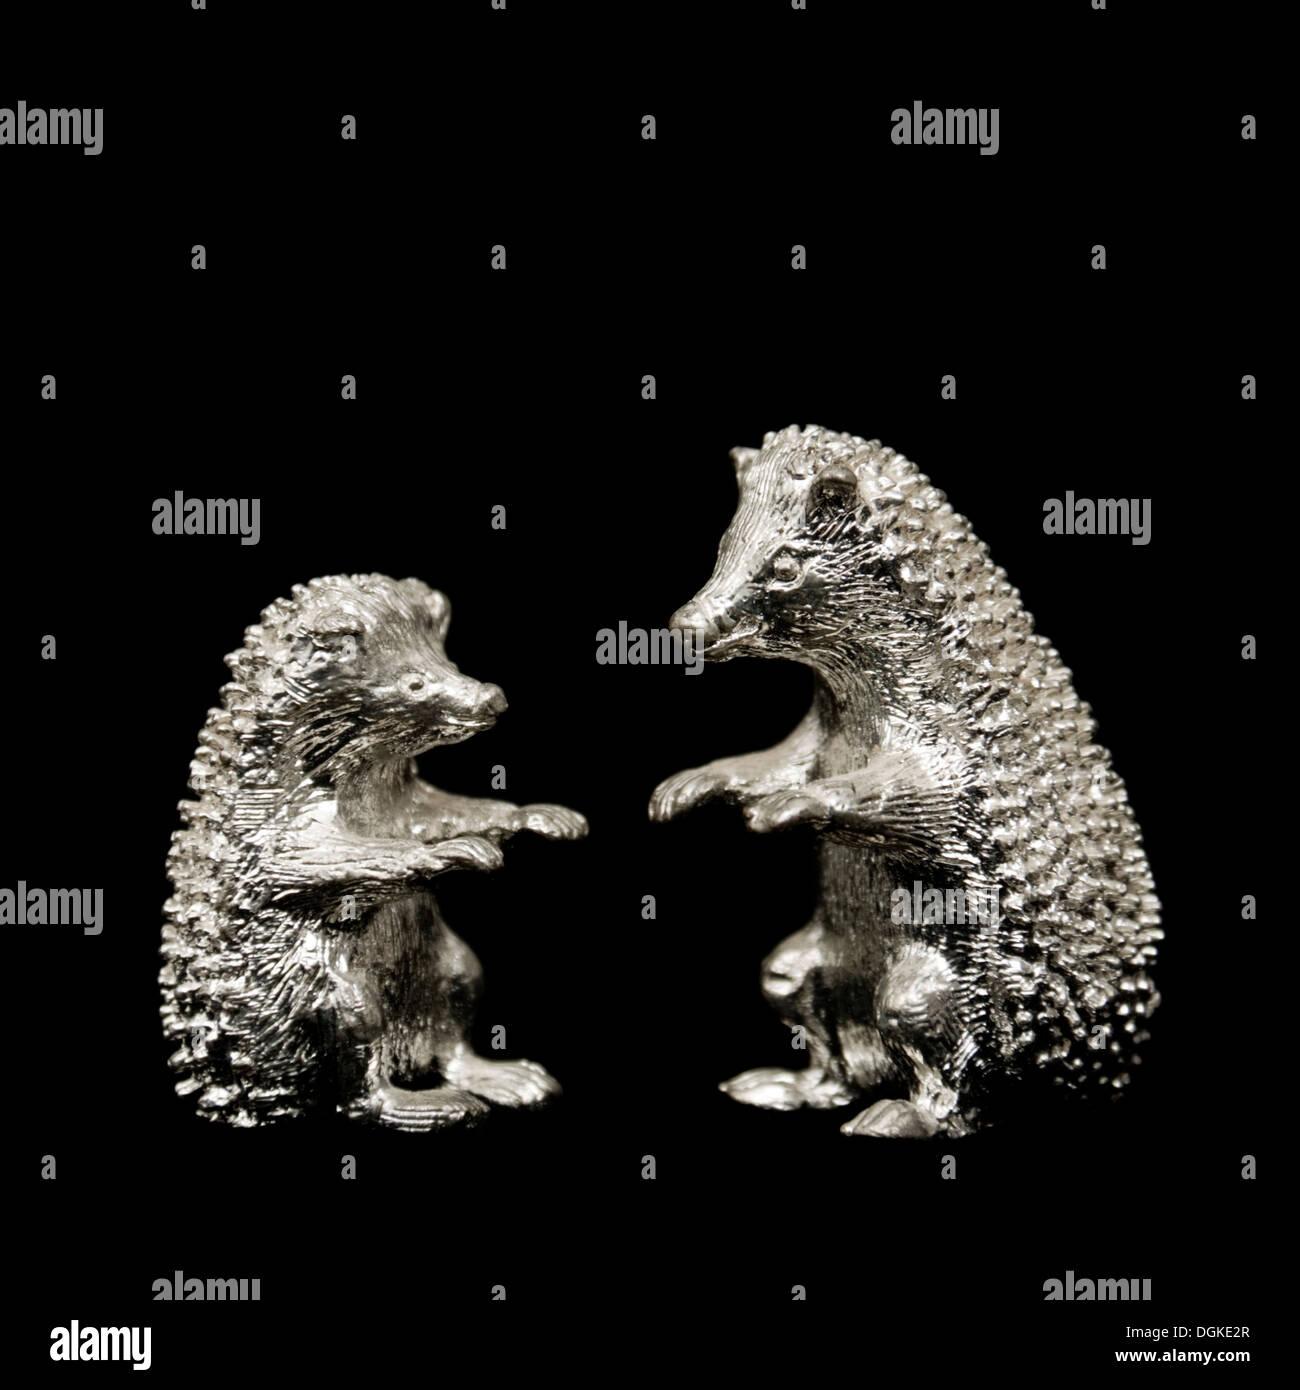 Pair of hedgehog ornaments - Stock Image